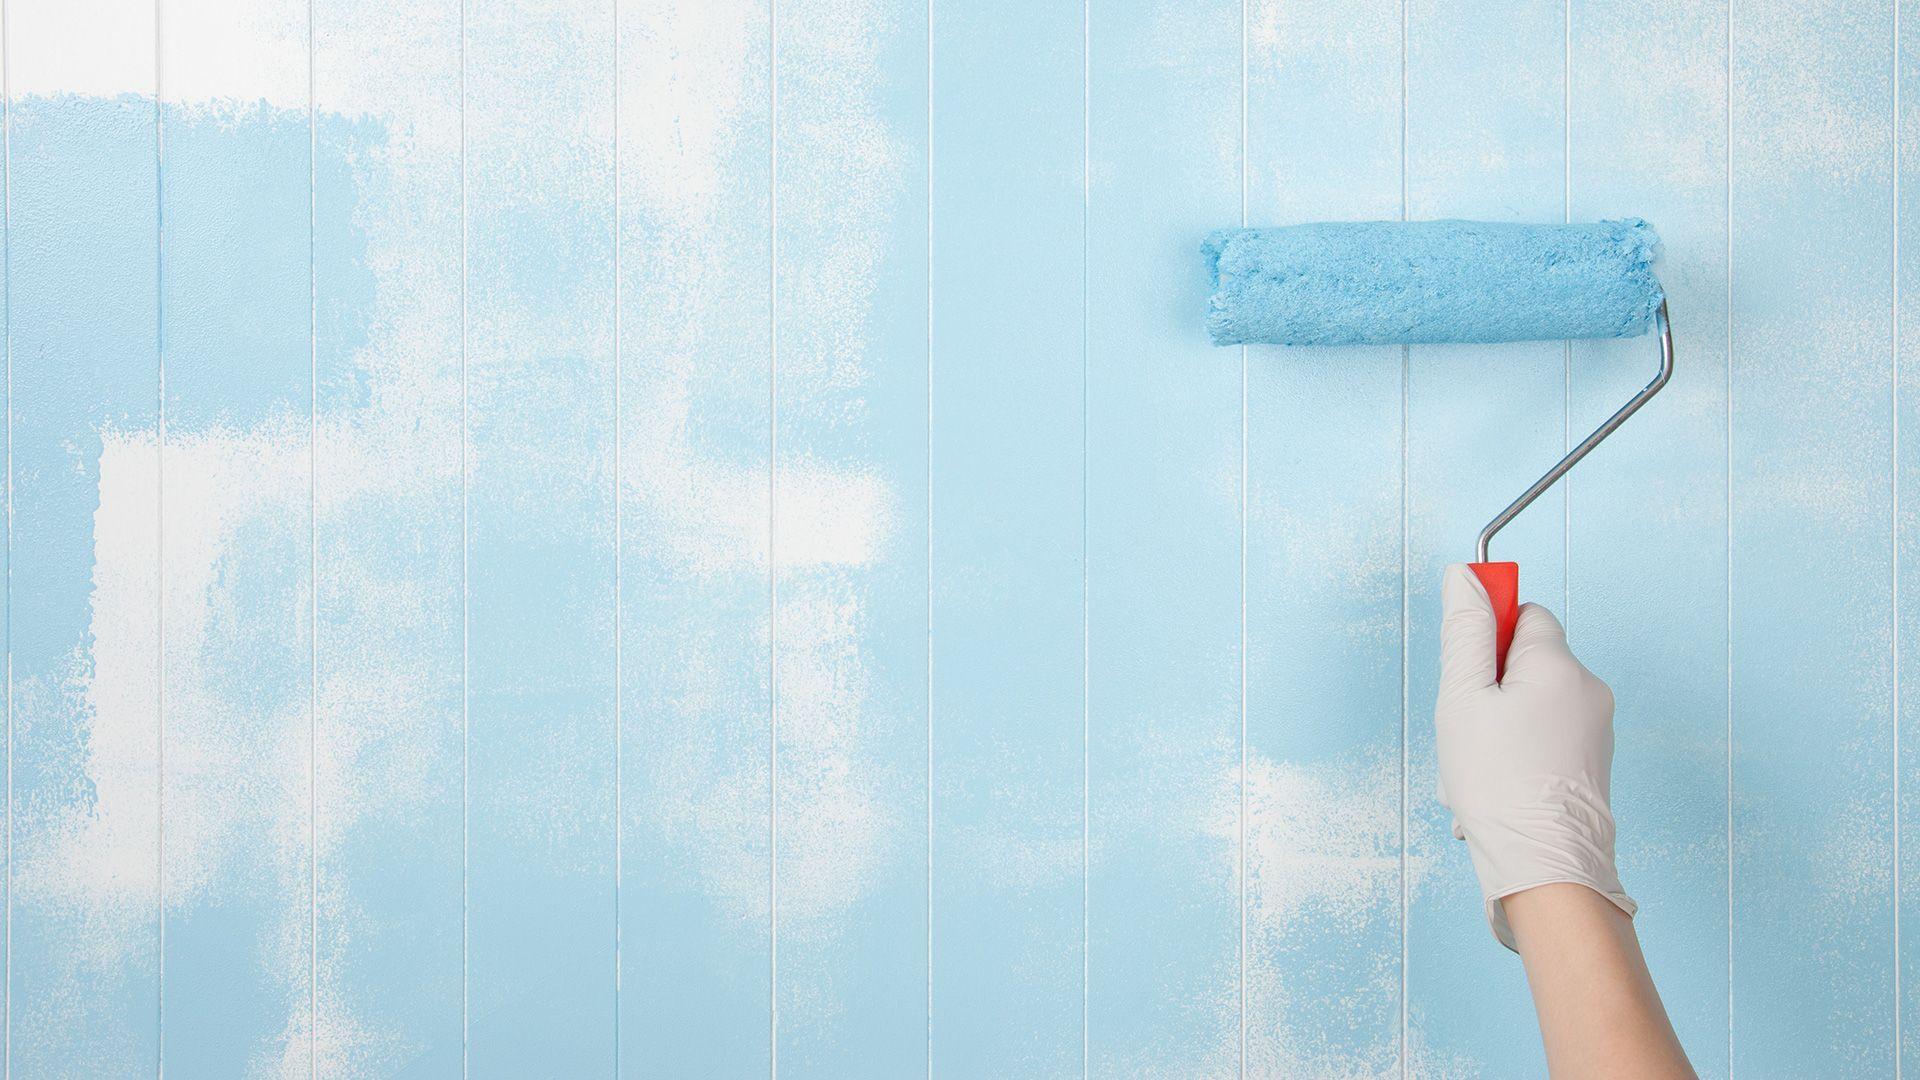 verf je slaapkamer blauw